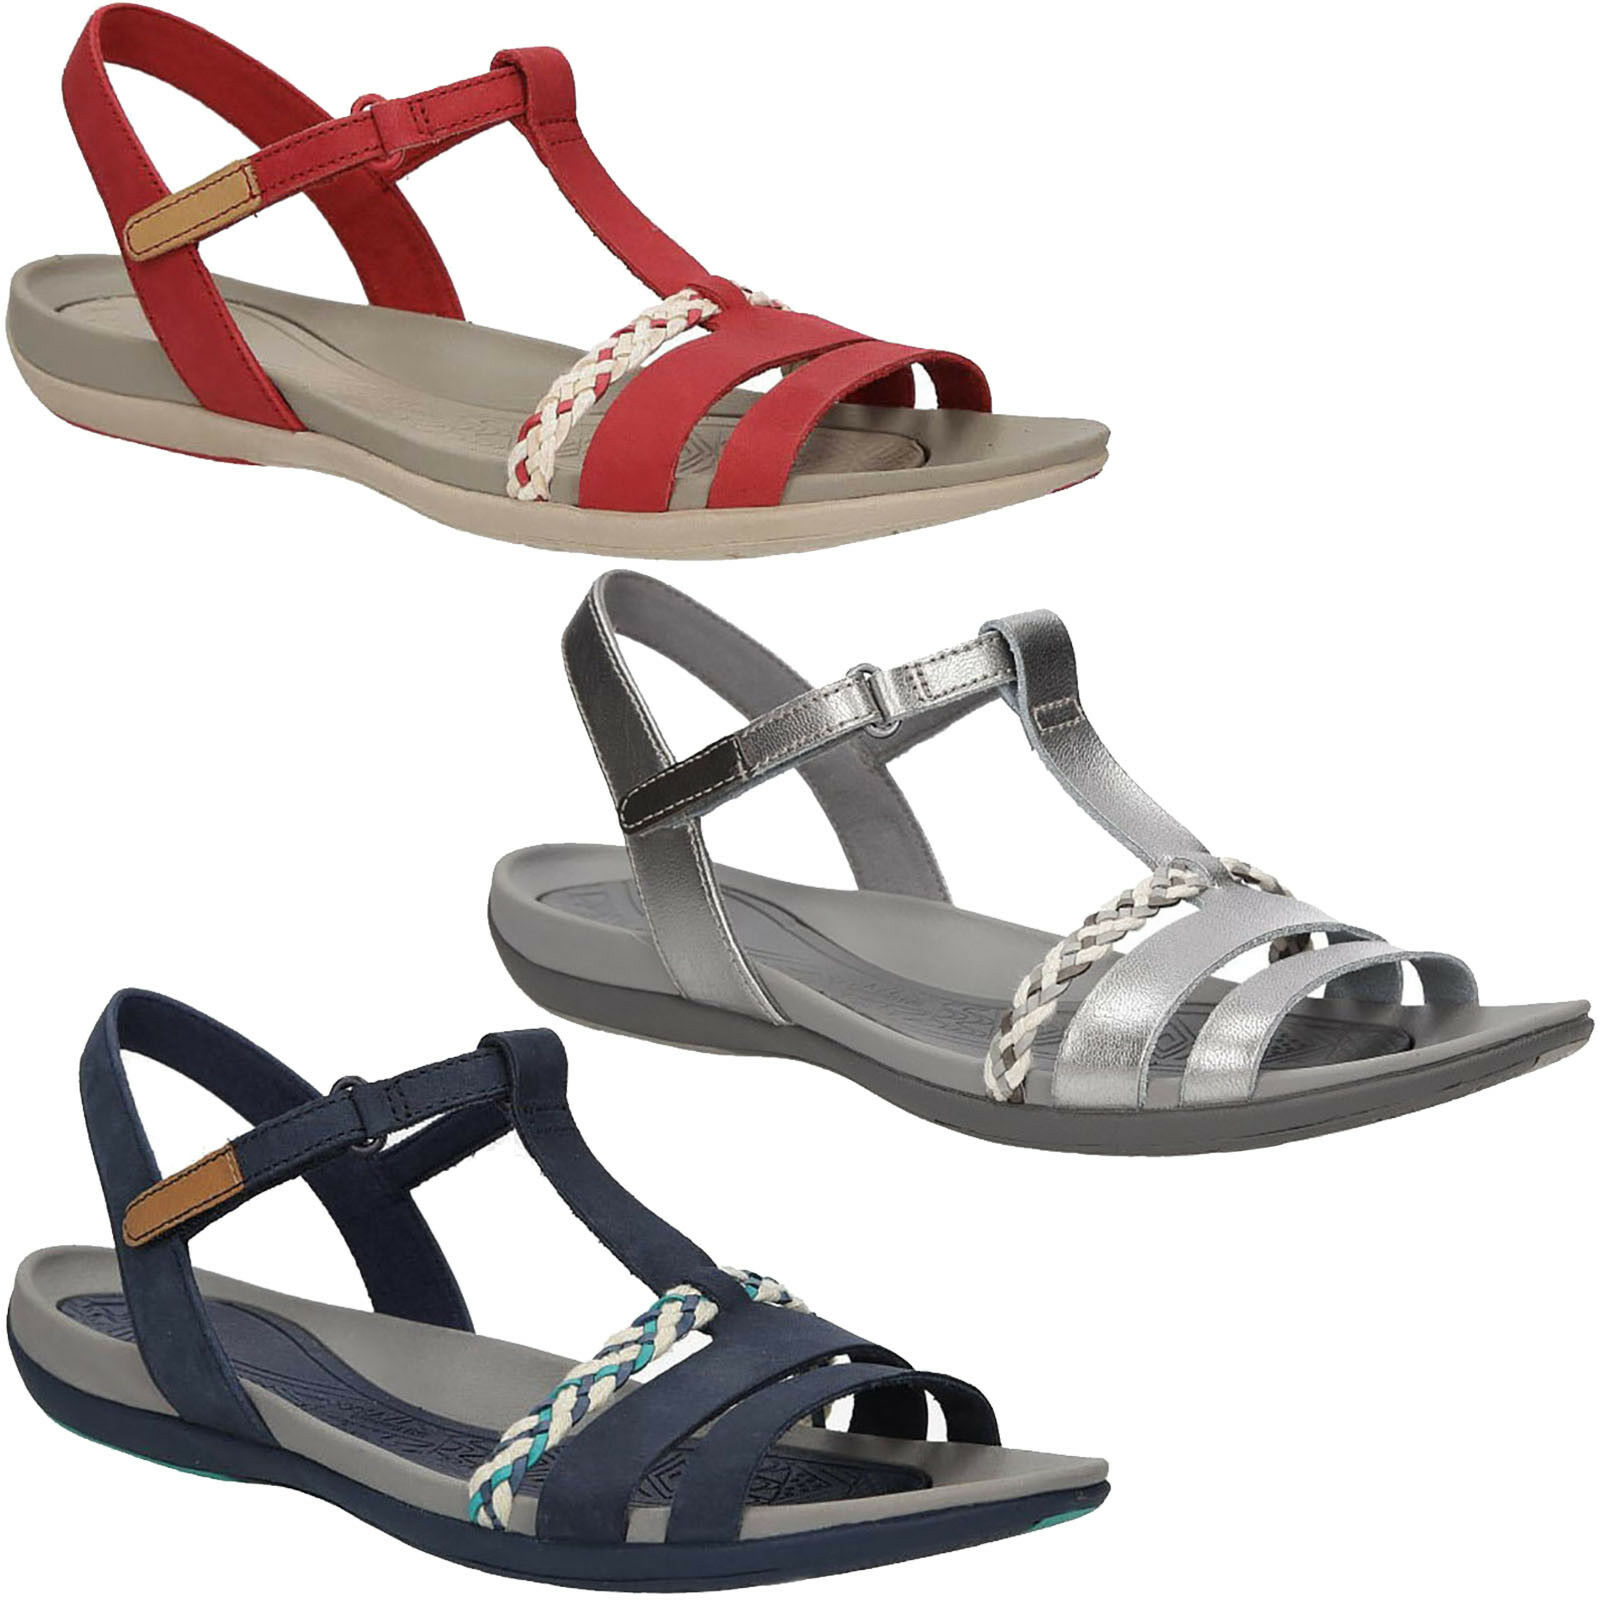 Damen Sandaletten Clarks Tealite 26123943 Leder Klettverschluss Gr. 36-41 SALE %